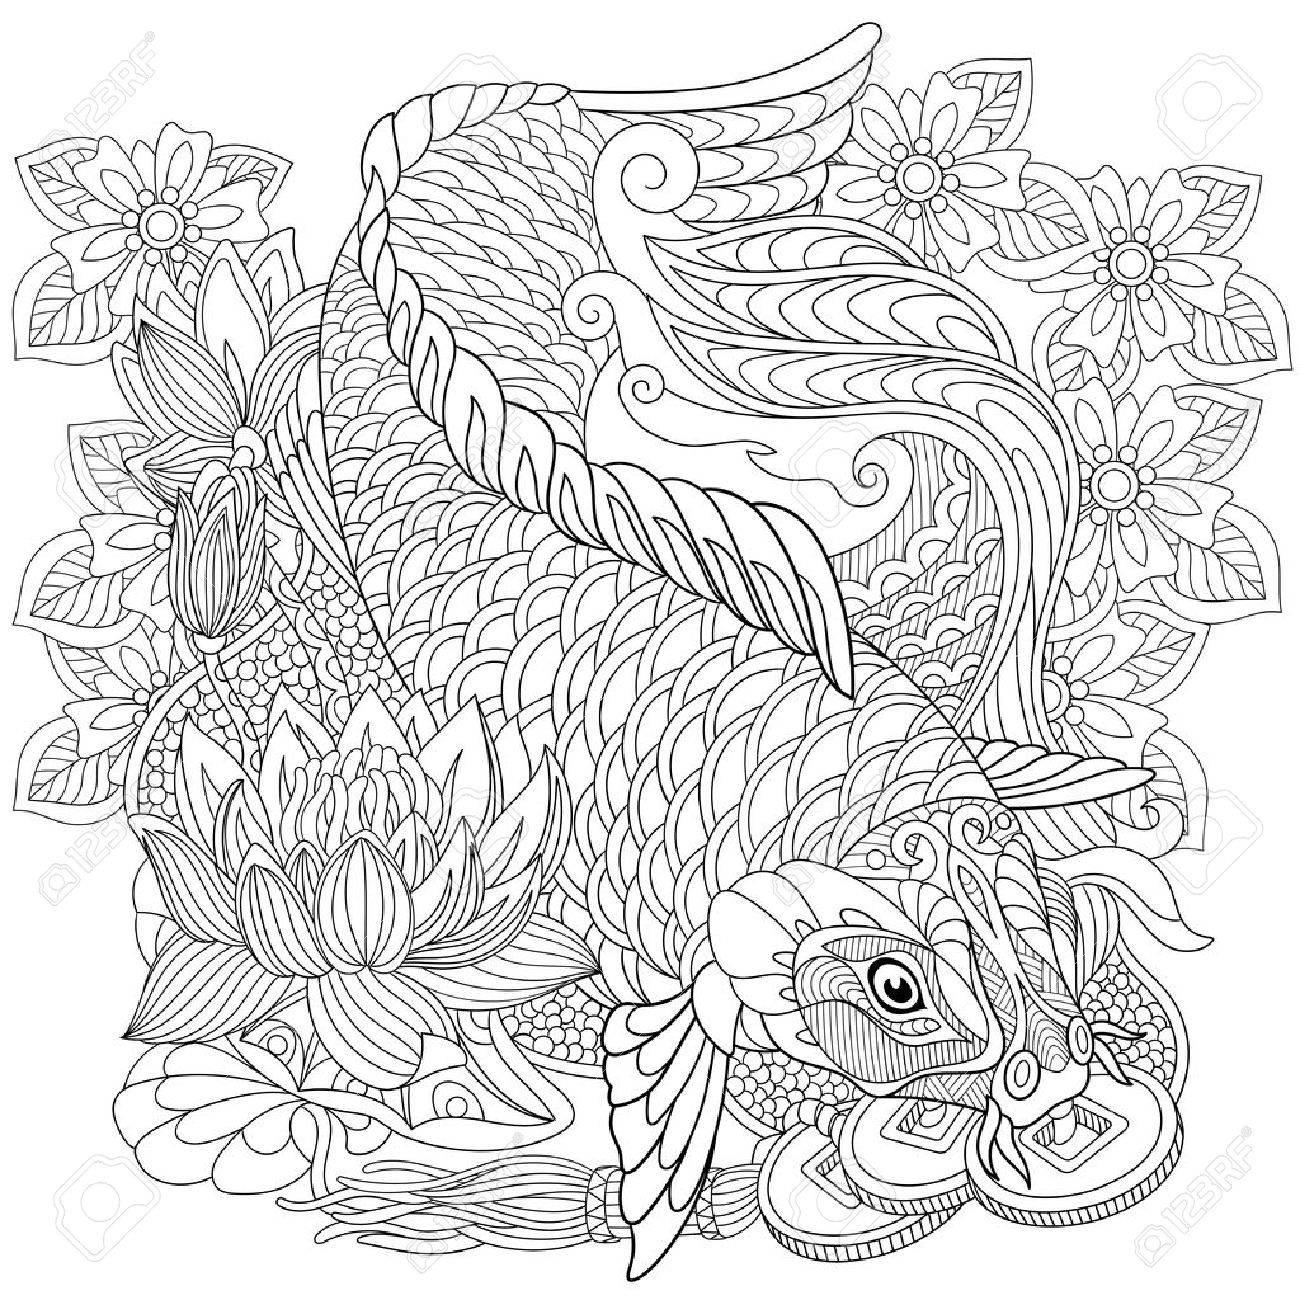 stylized cartoon koi carp - 58387319